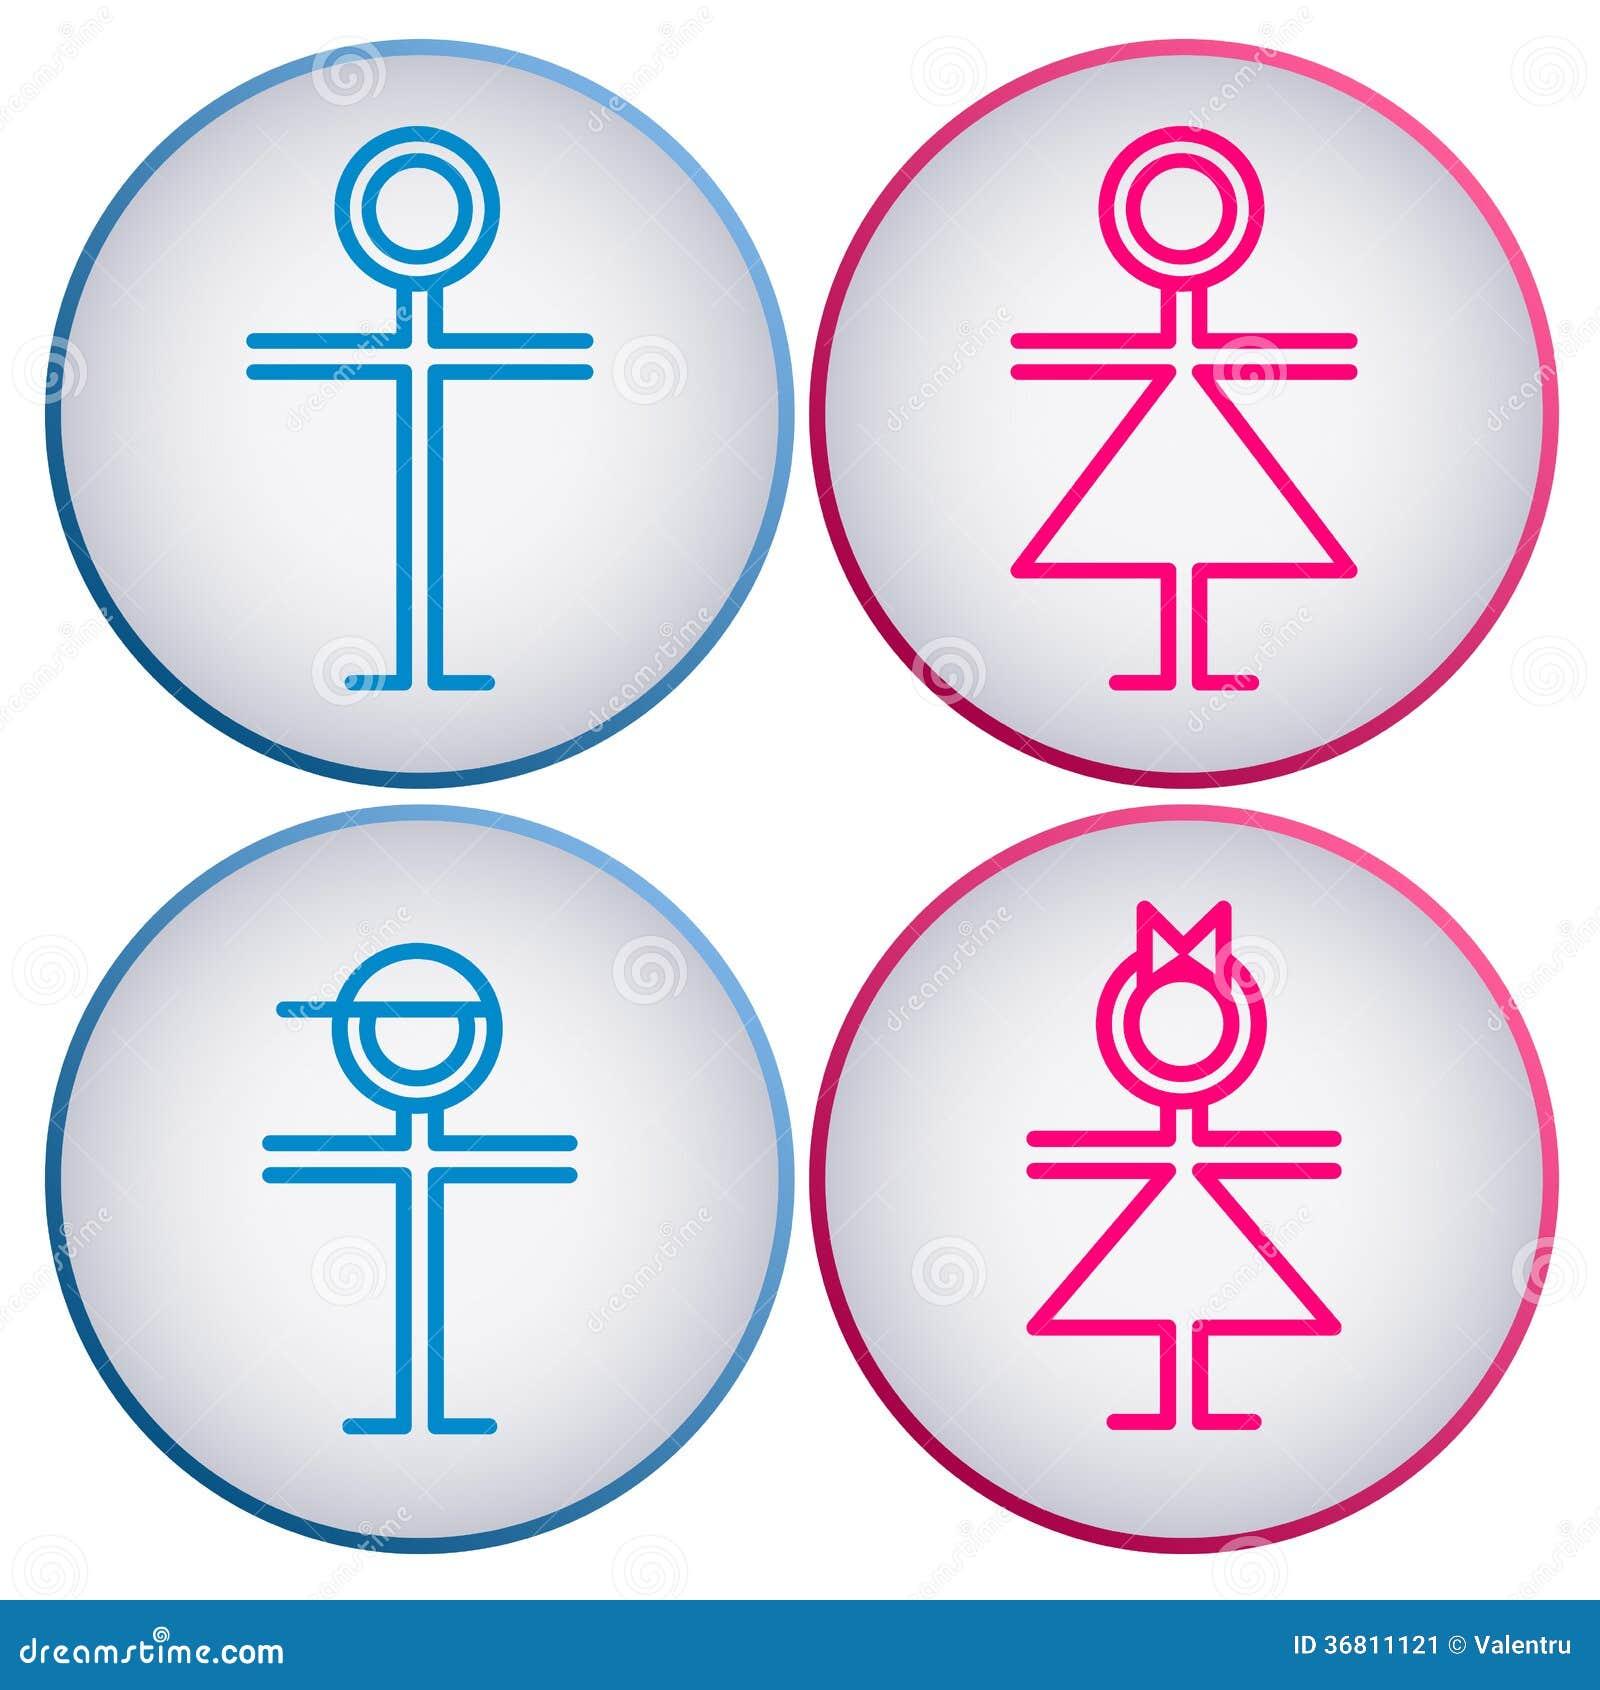 Bathroom Sign Boy Girl toilet symbol, bathroom man and woman sign stock illustration